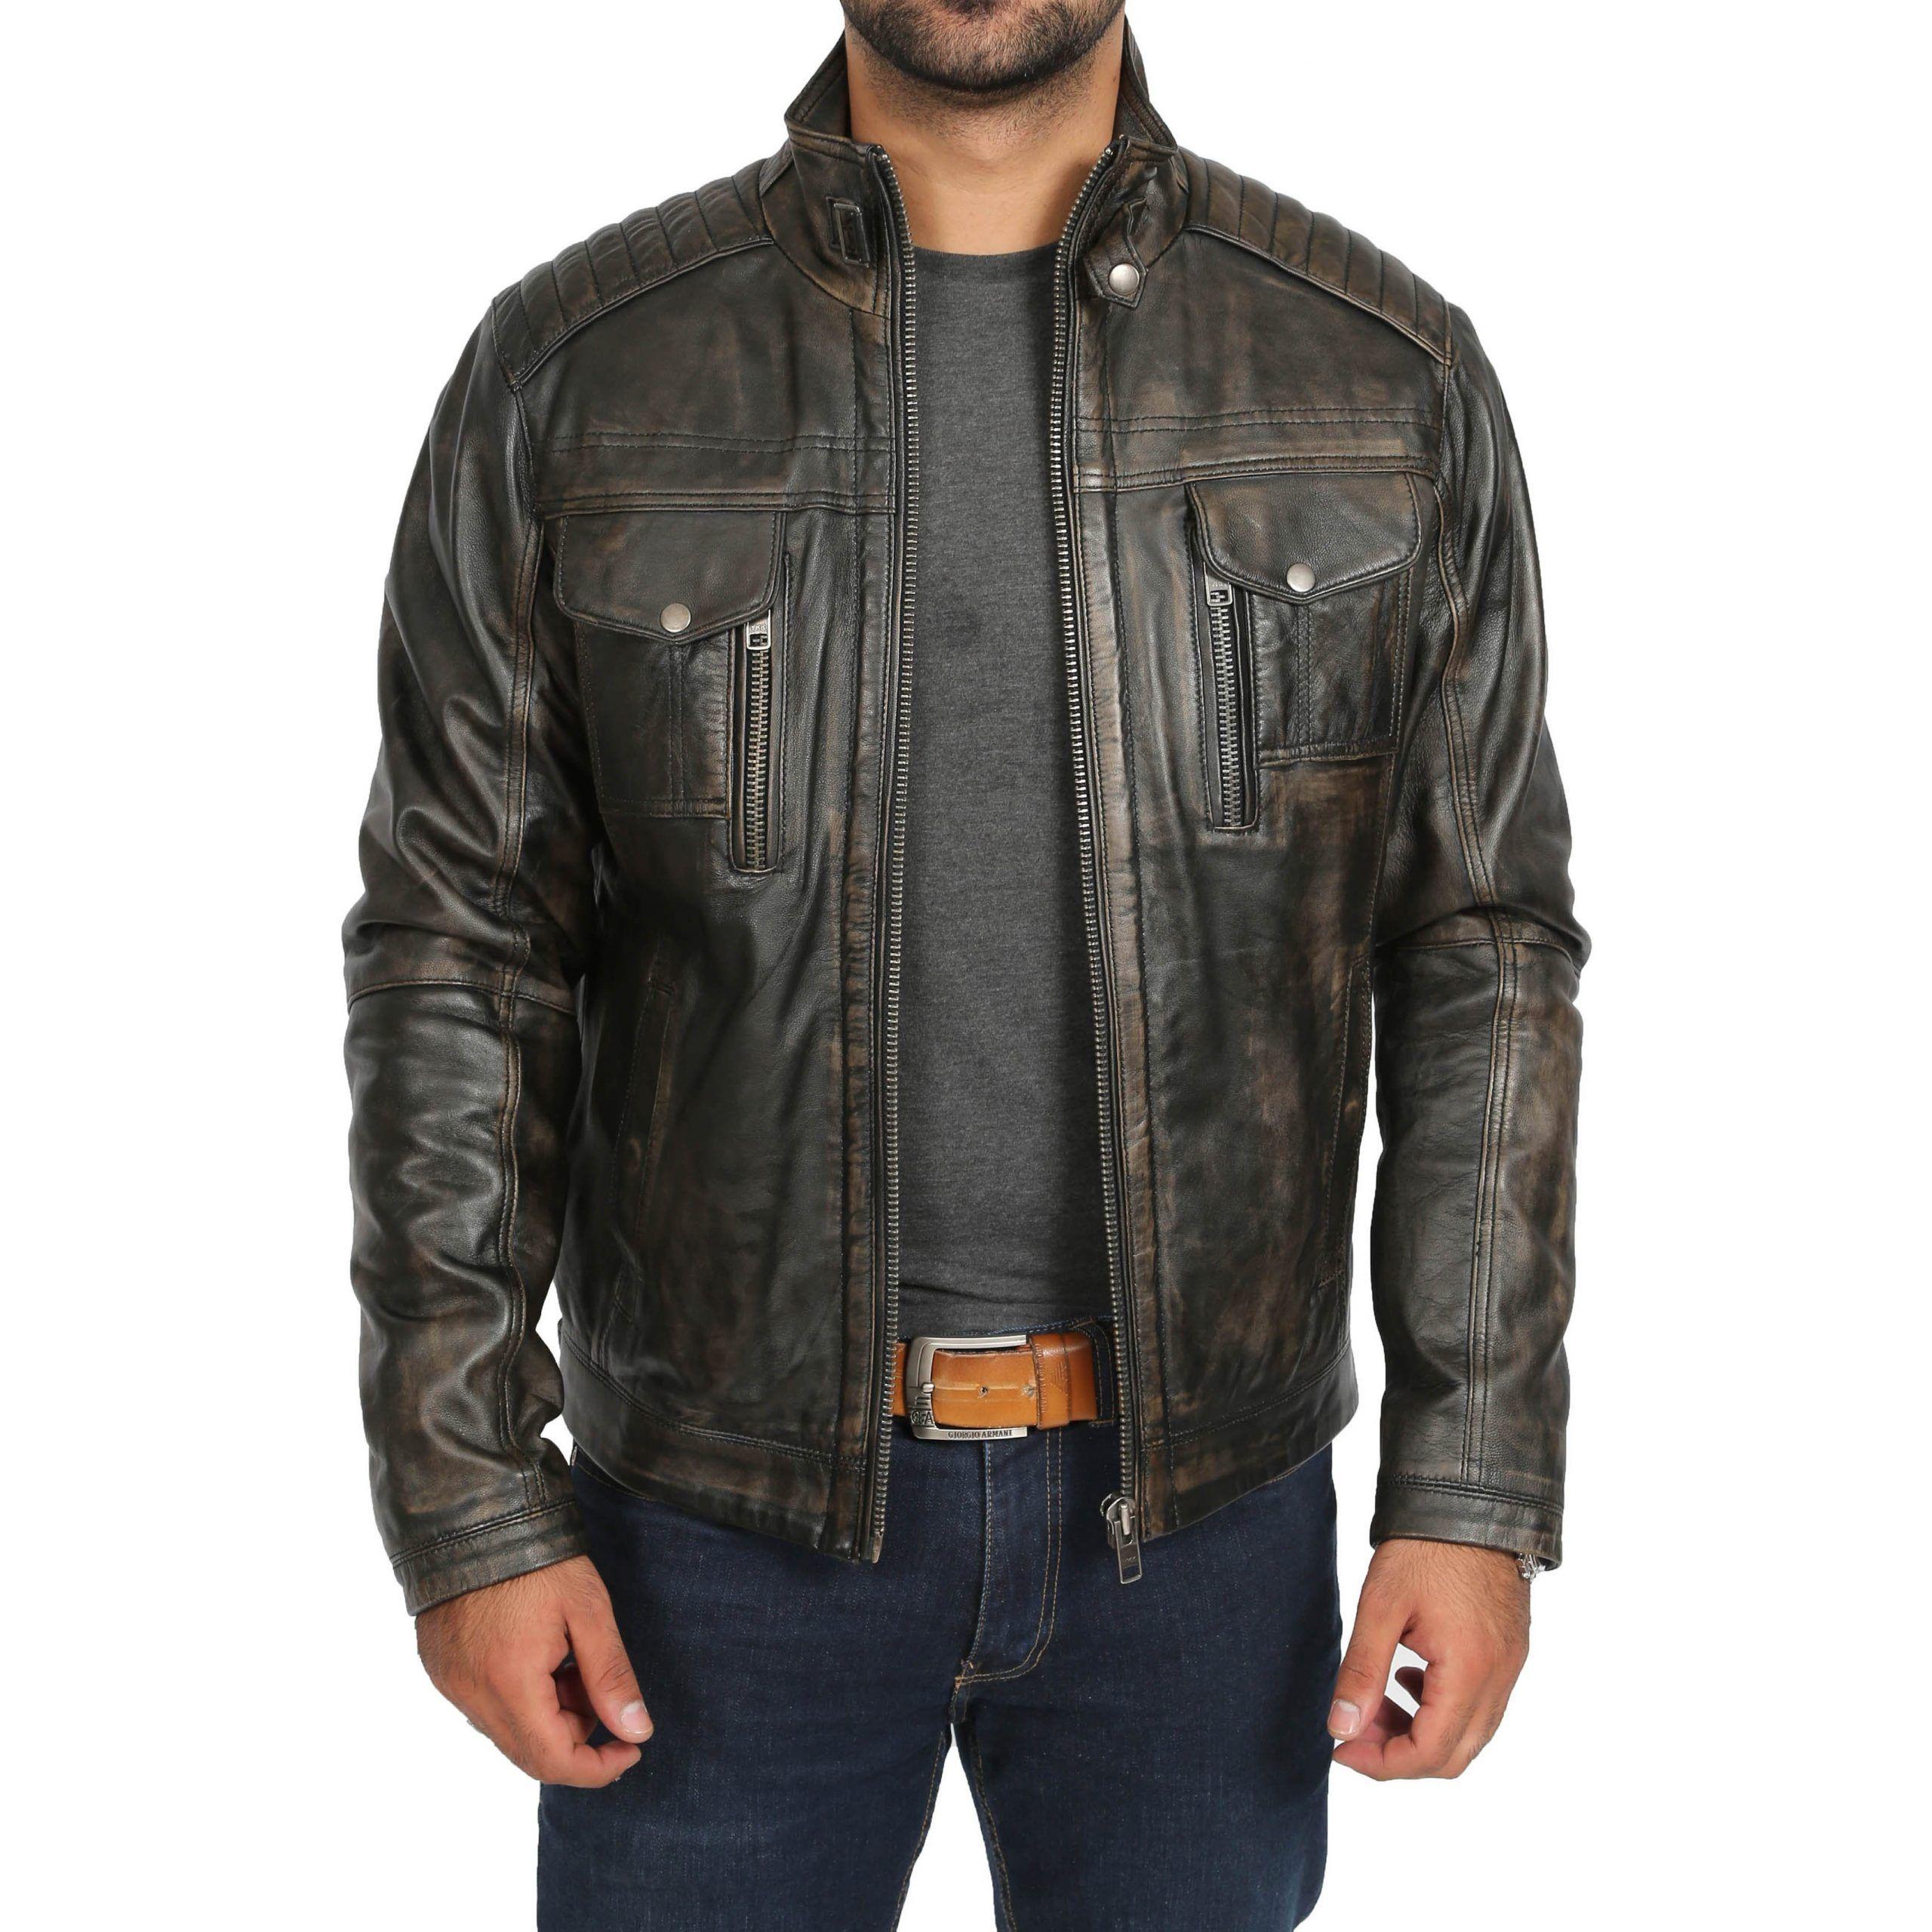 URBAN Men/'s Genuine Sheepskin Leather Jacket Biker Black Premium Trendy Designer